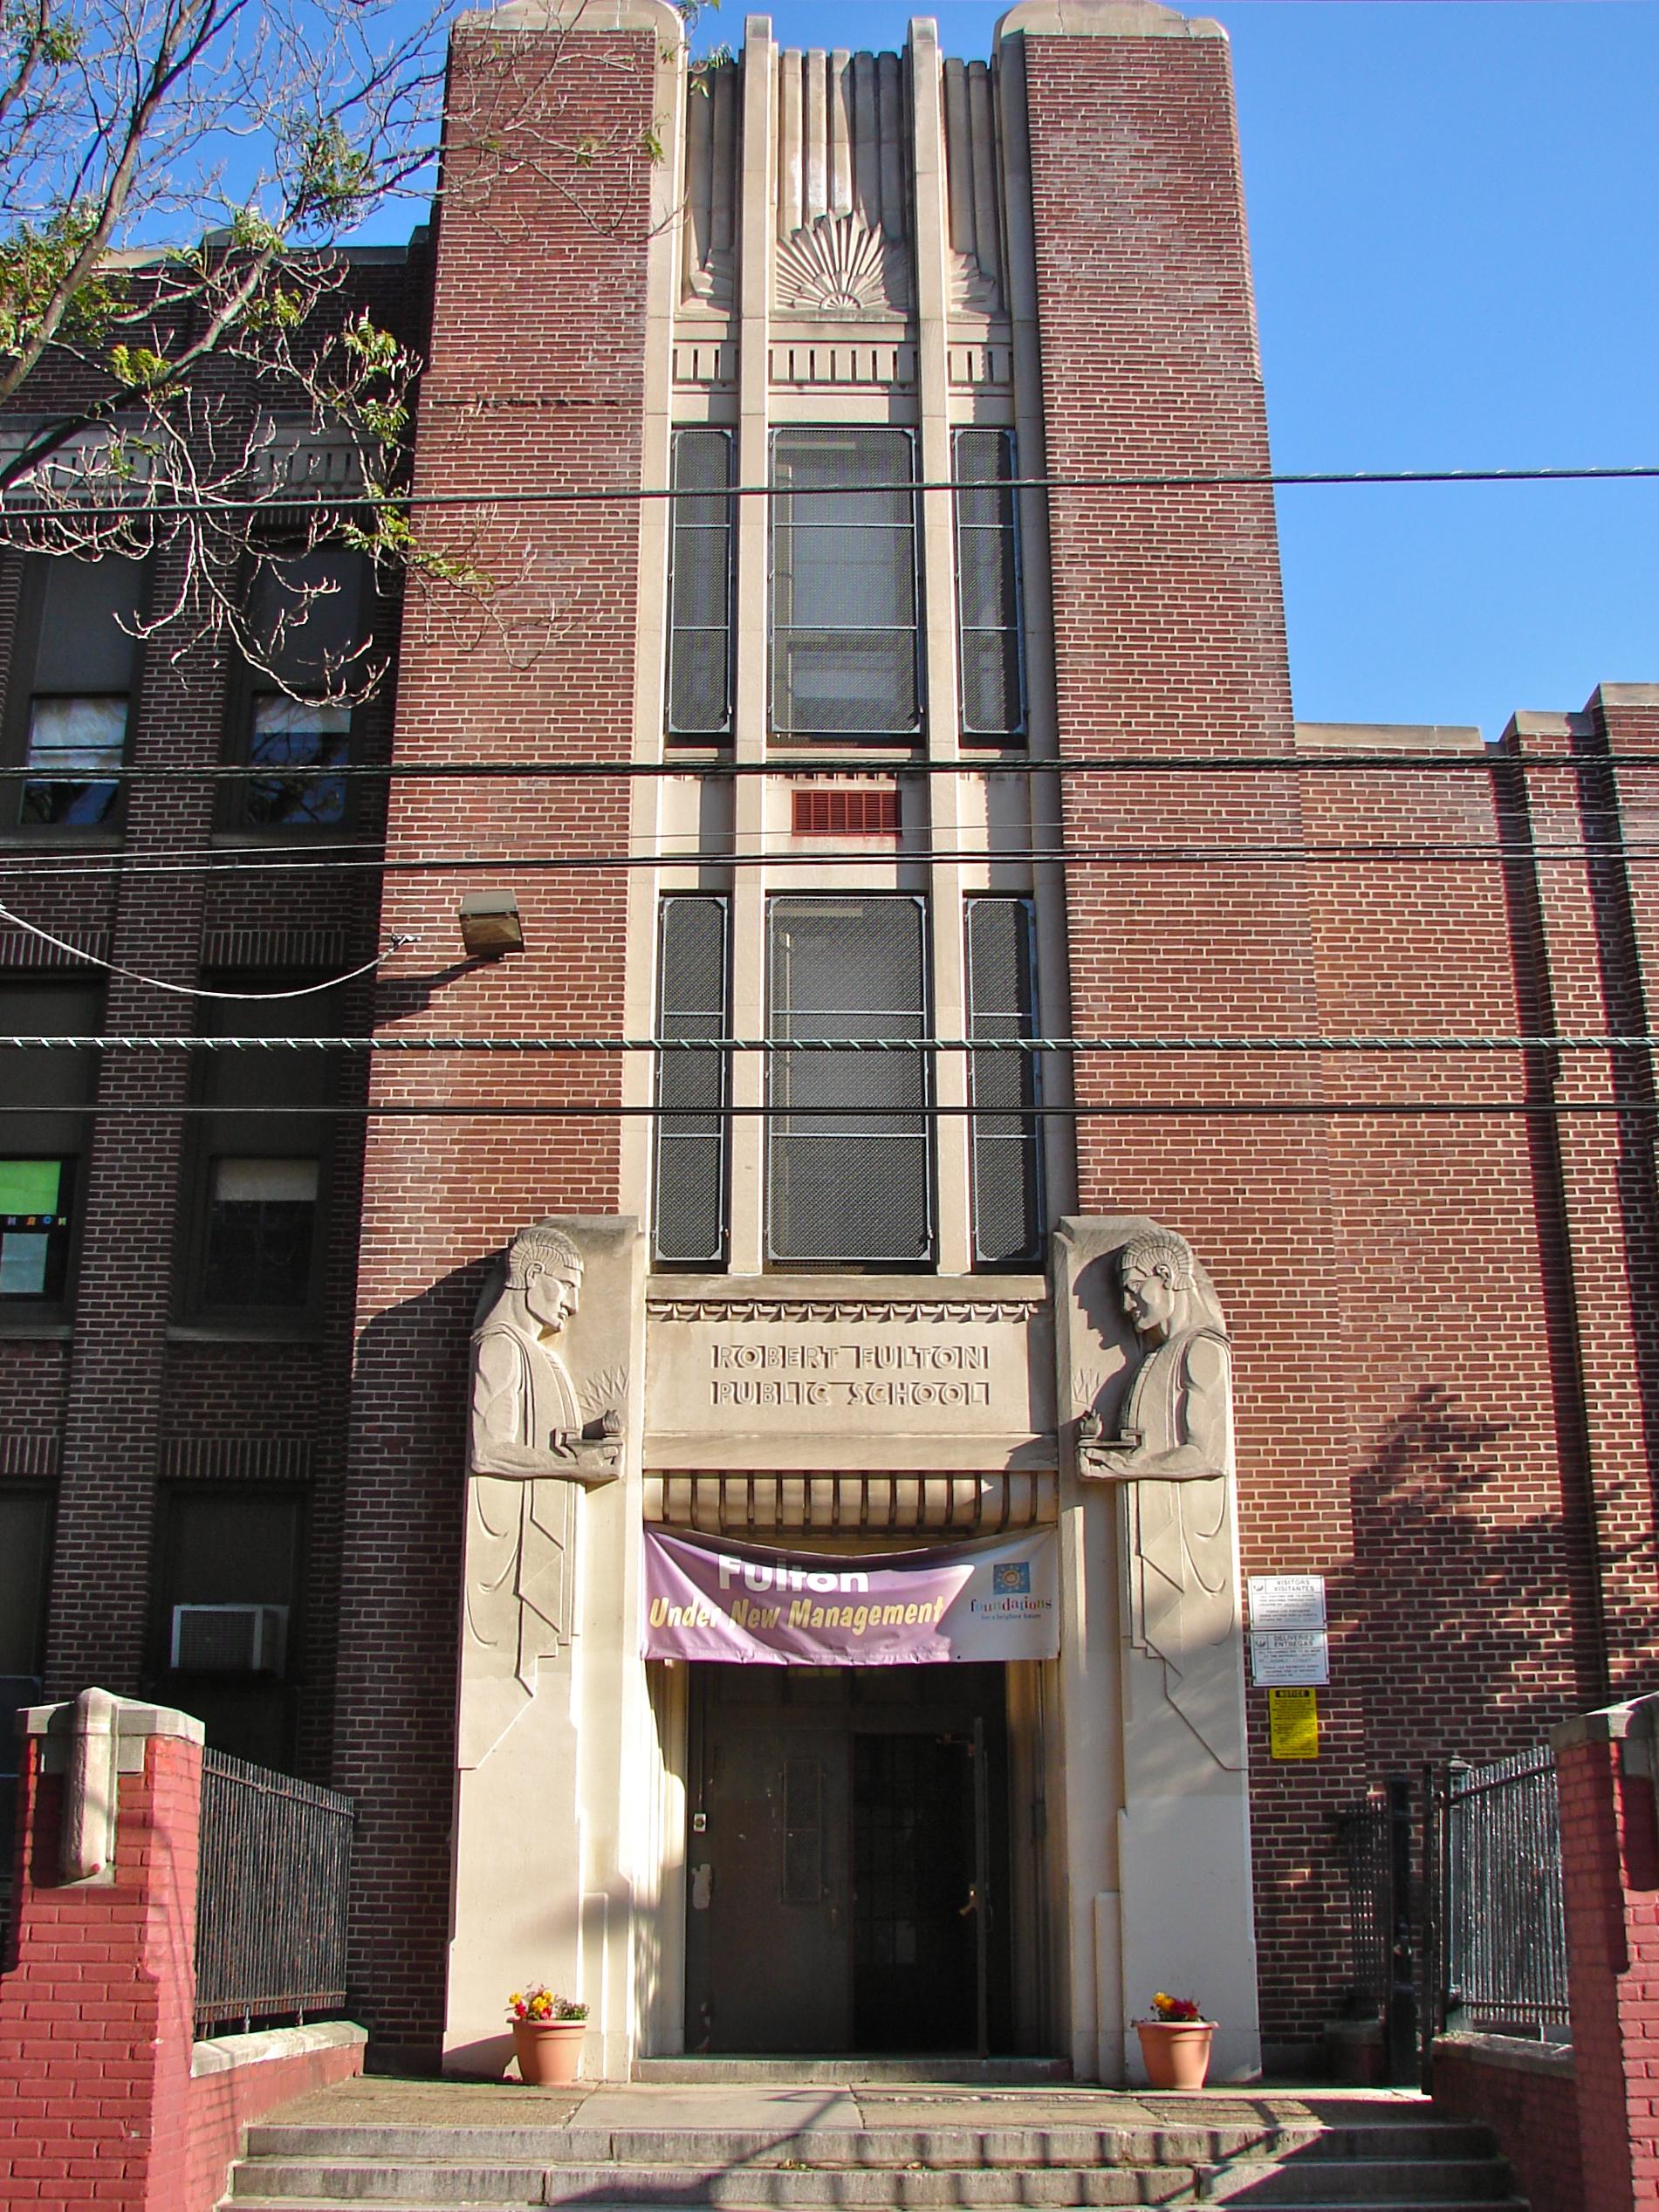 Robert Fulton School Wikipedia